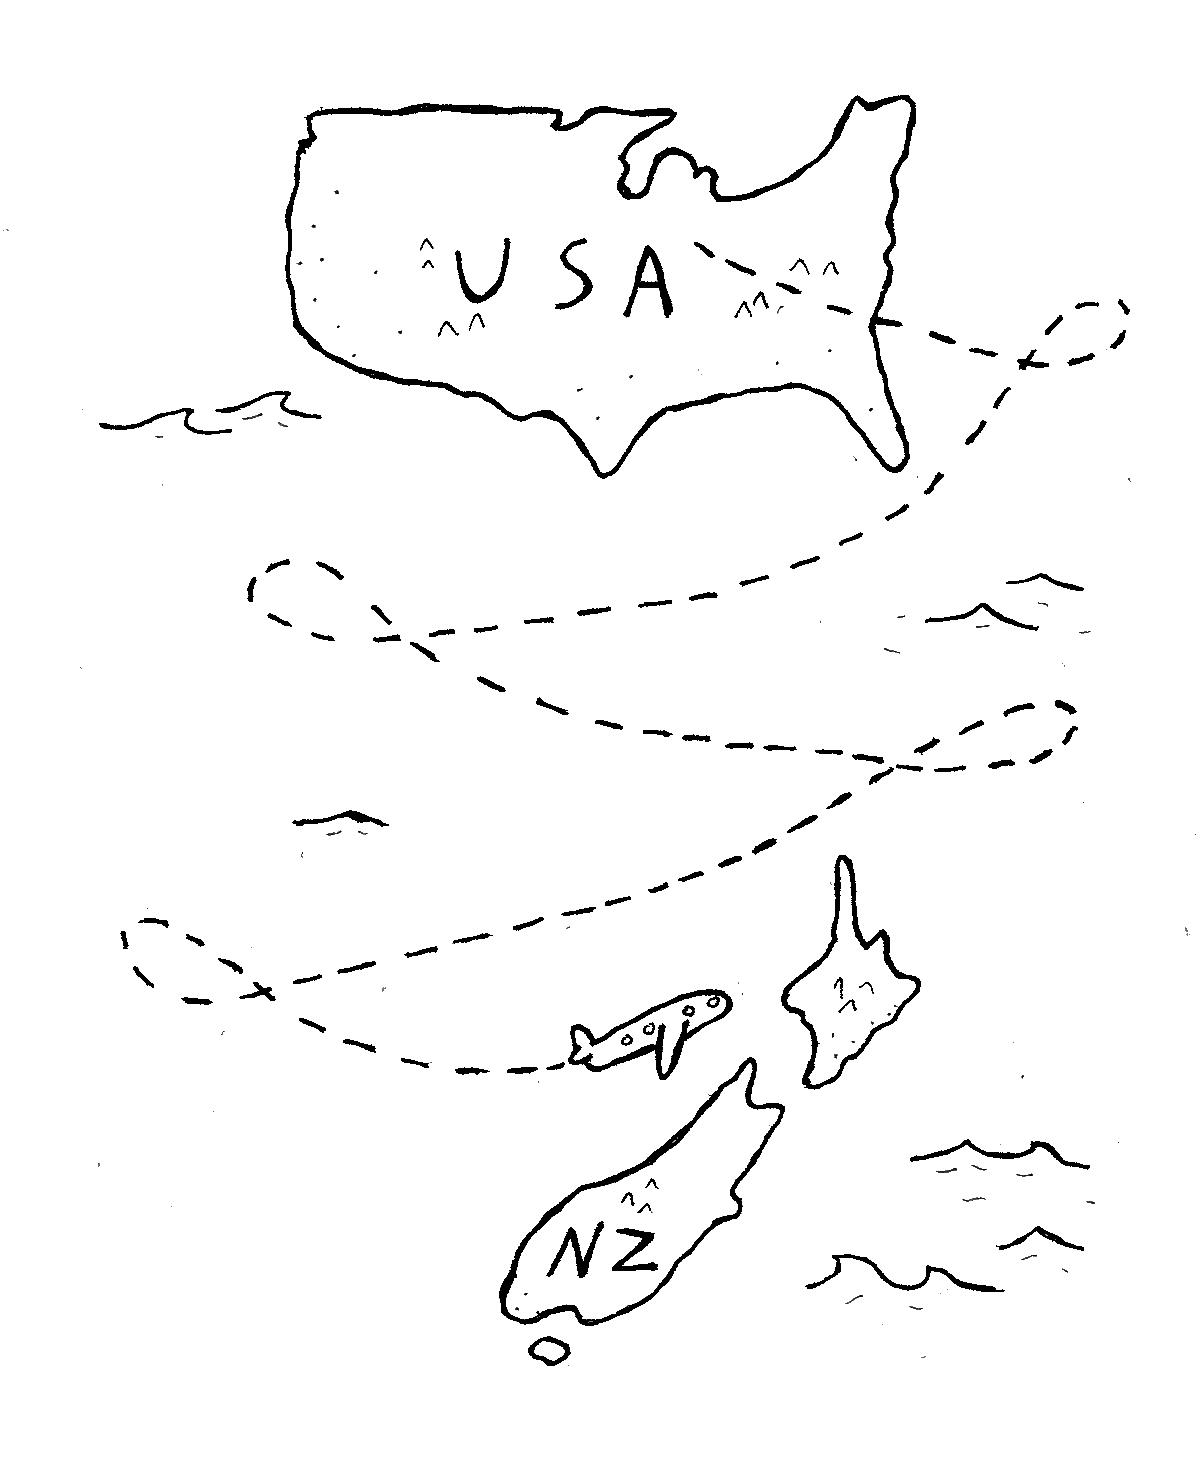 46US to NZ.jpg